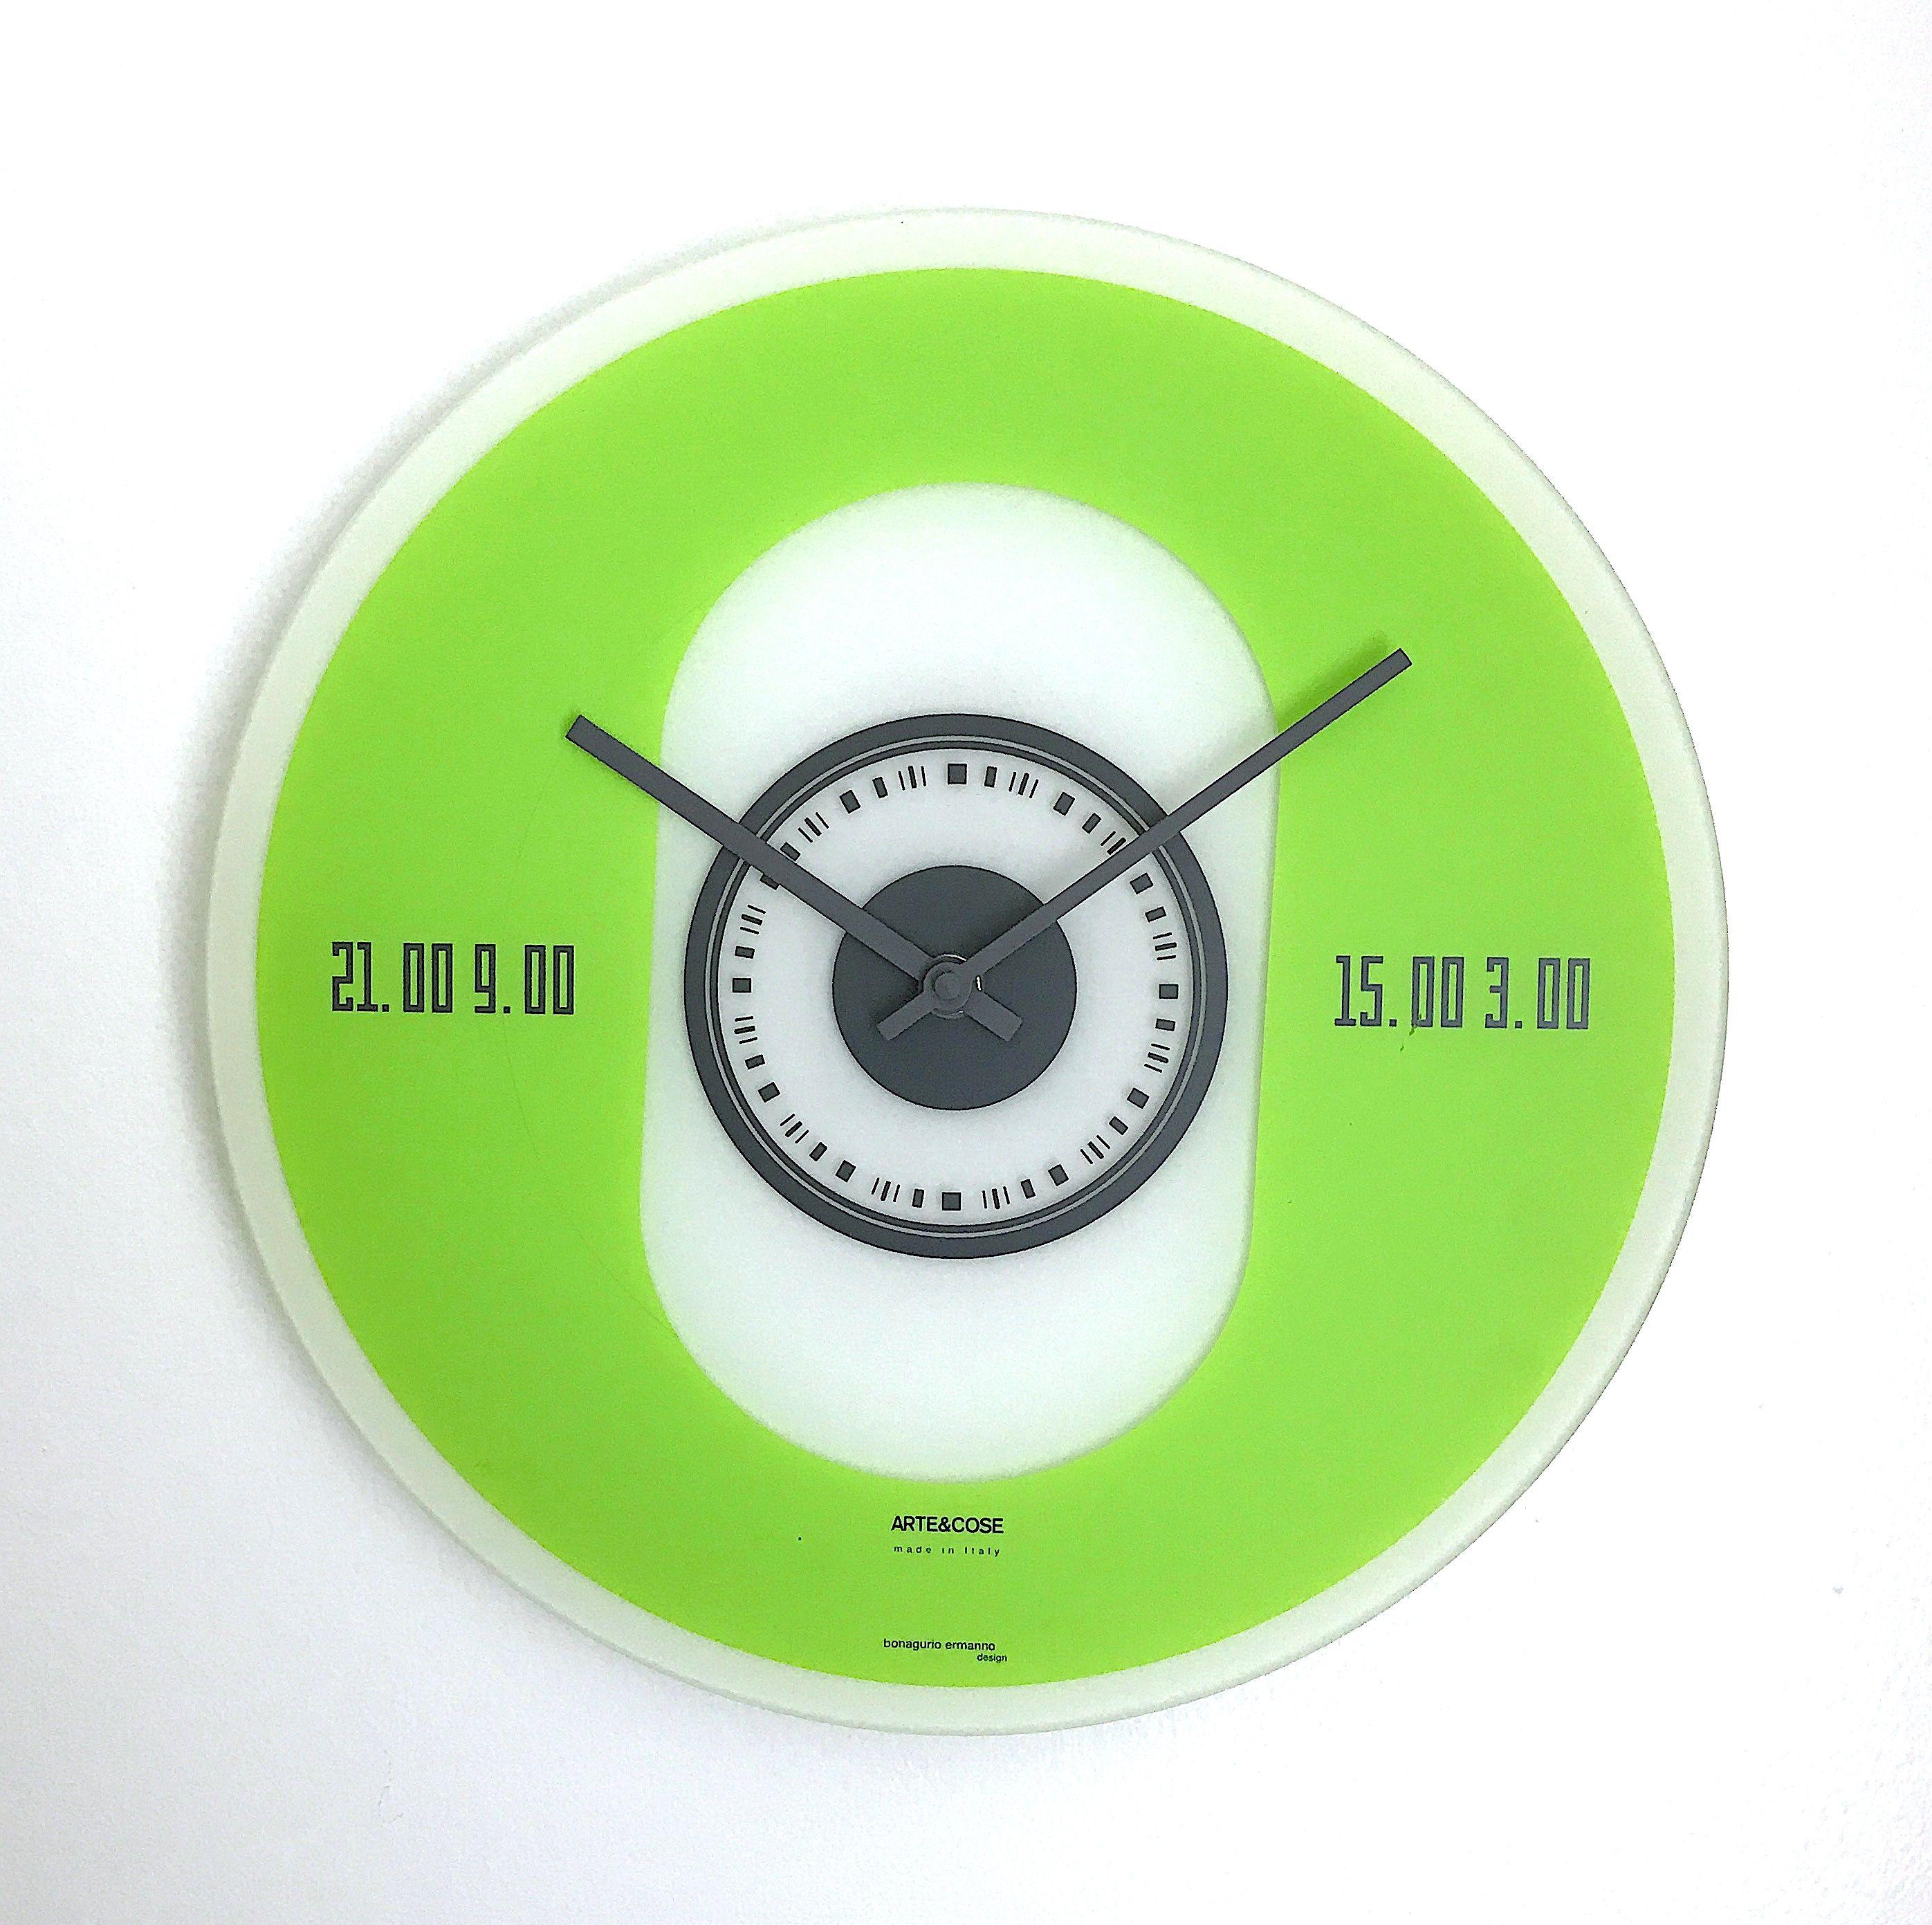 Artecose wall clock by bonagurio ermanno design mad for mod artecose wall clock by bonagurio ermanno design amipublicfo Images